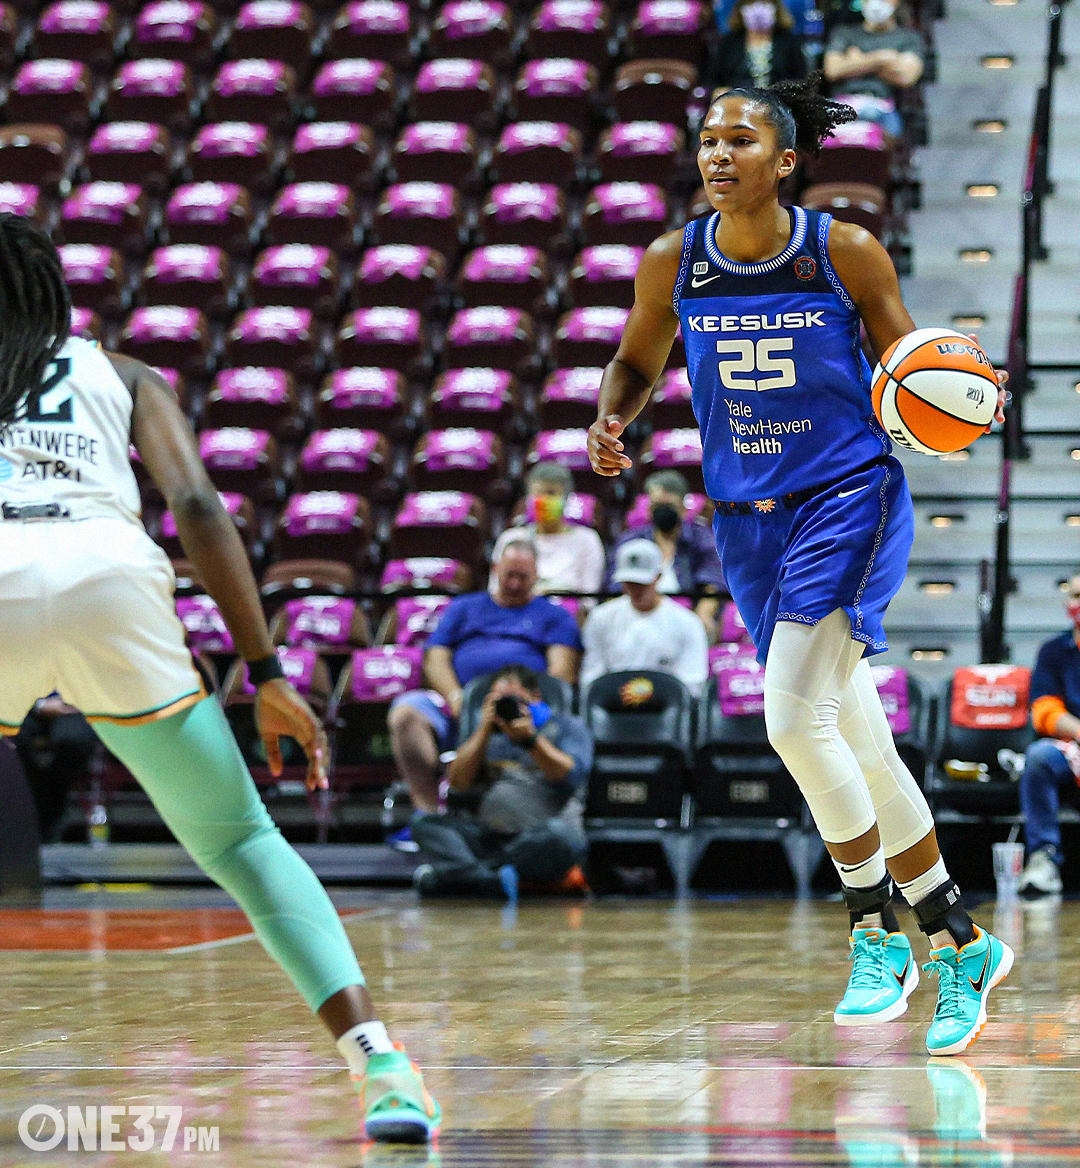 WNBA MOBILE 3